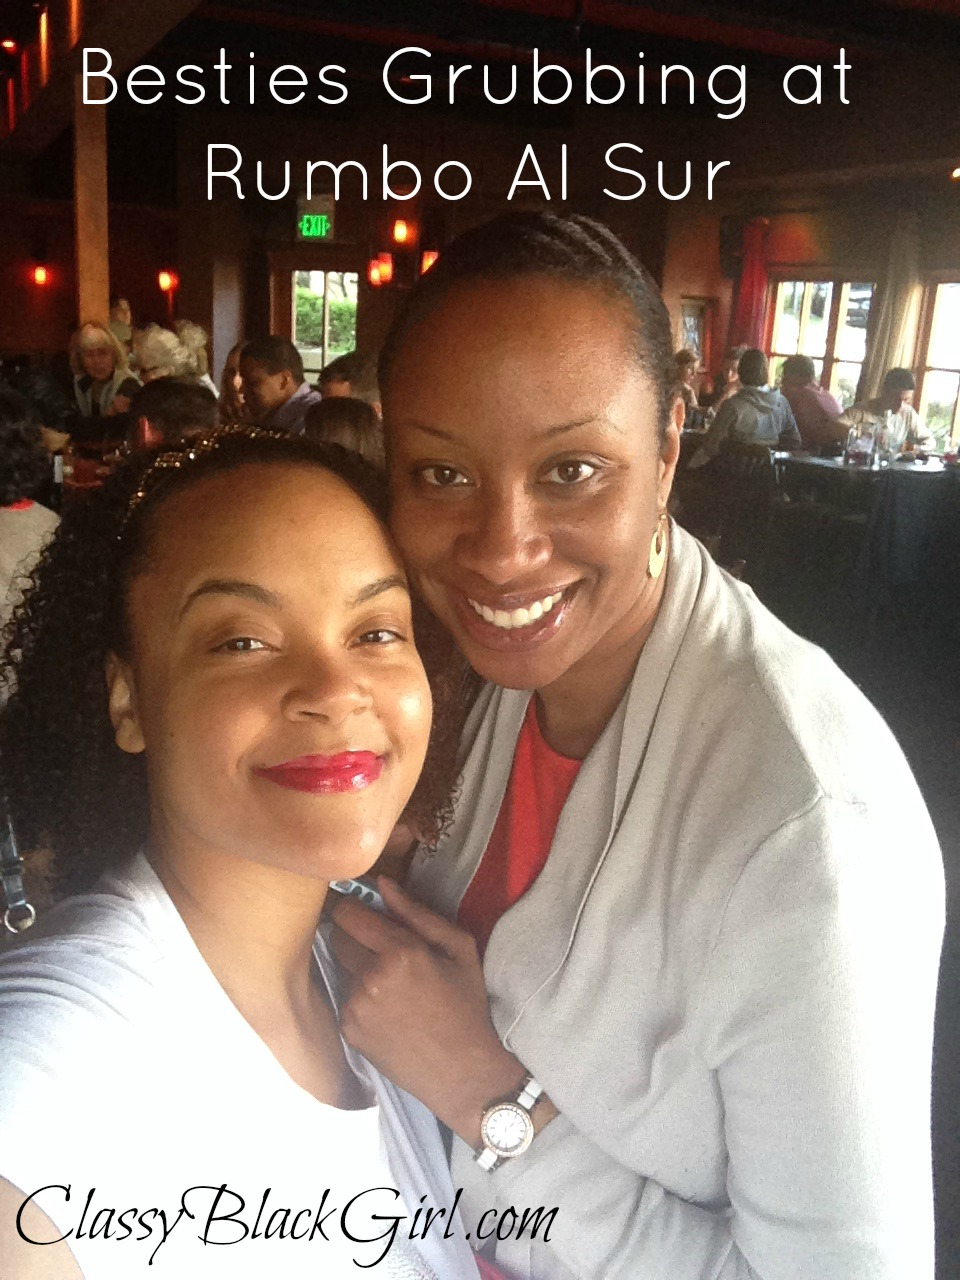 Rumbo Al Sur, Oakland, Restaurant, Food, Food Review, ClassyBlackGirl.com, Sharelle and Krystal